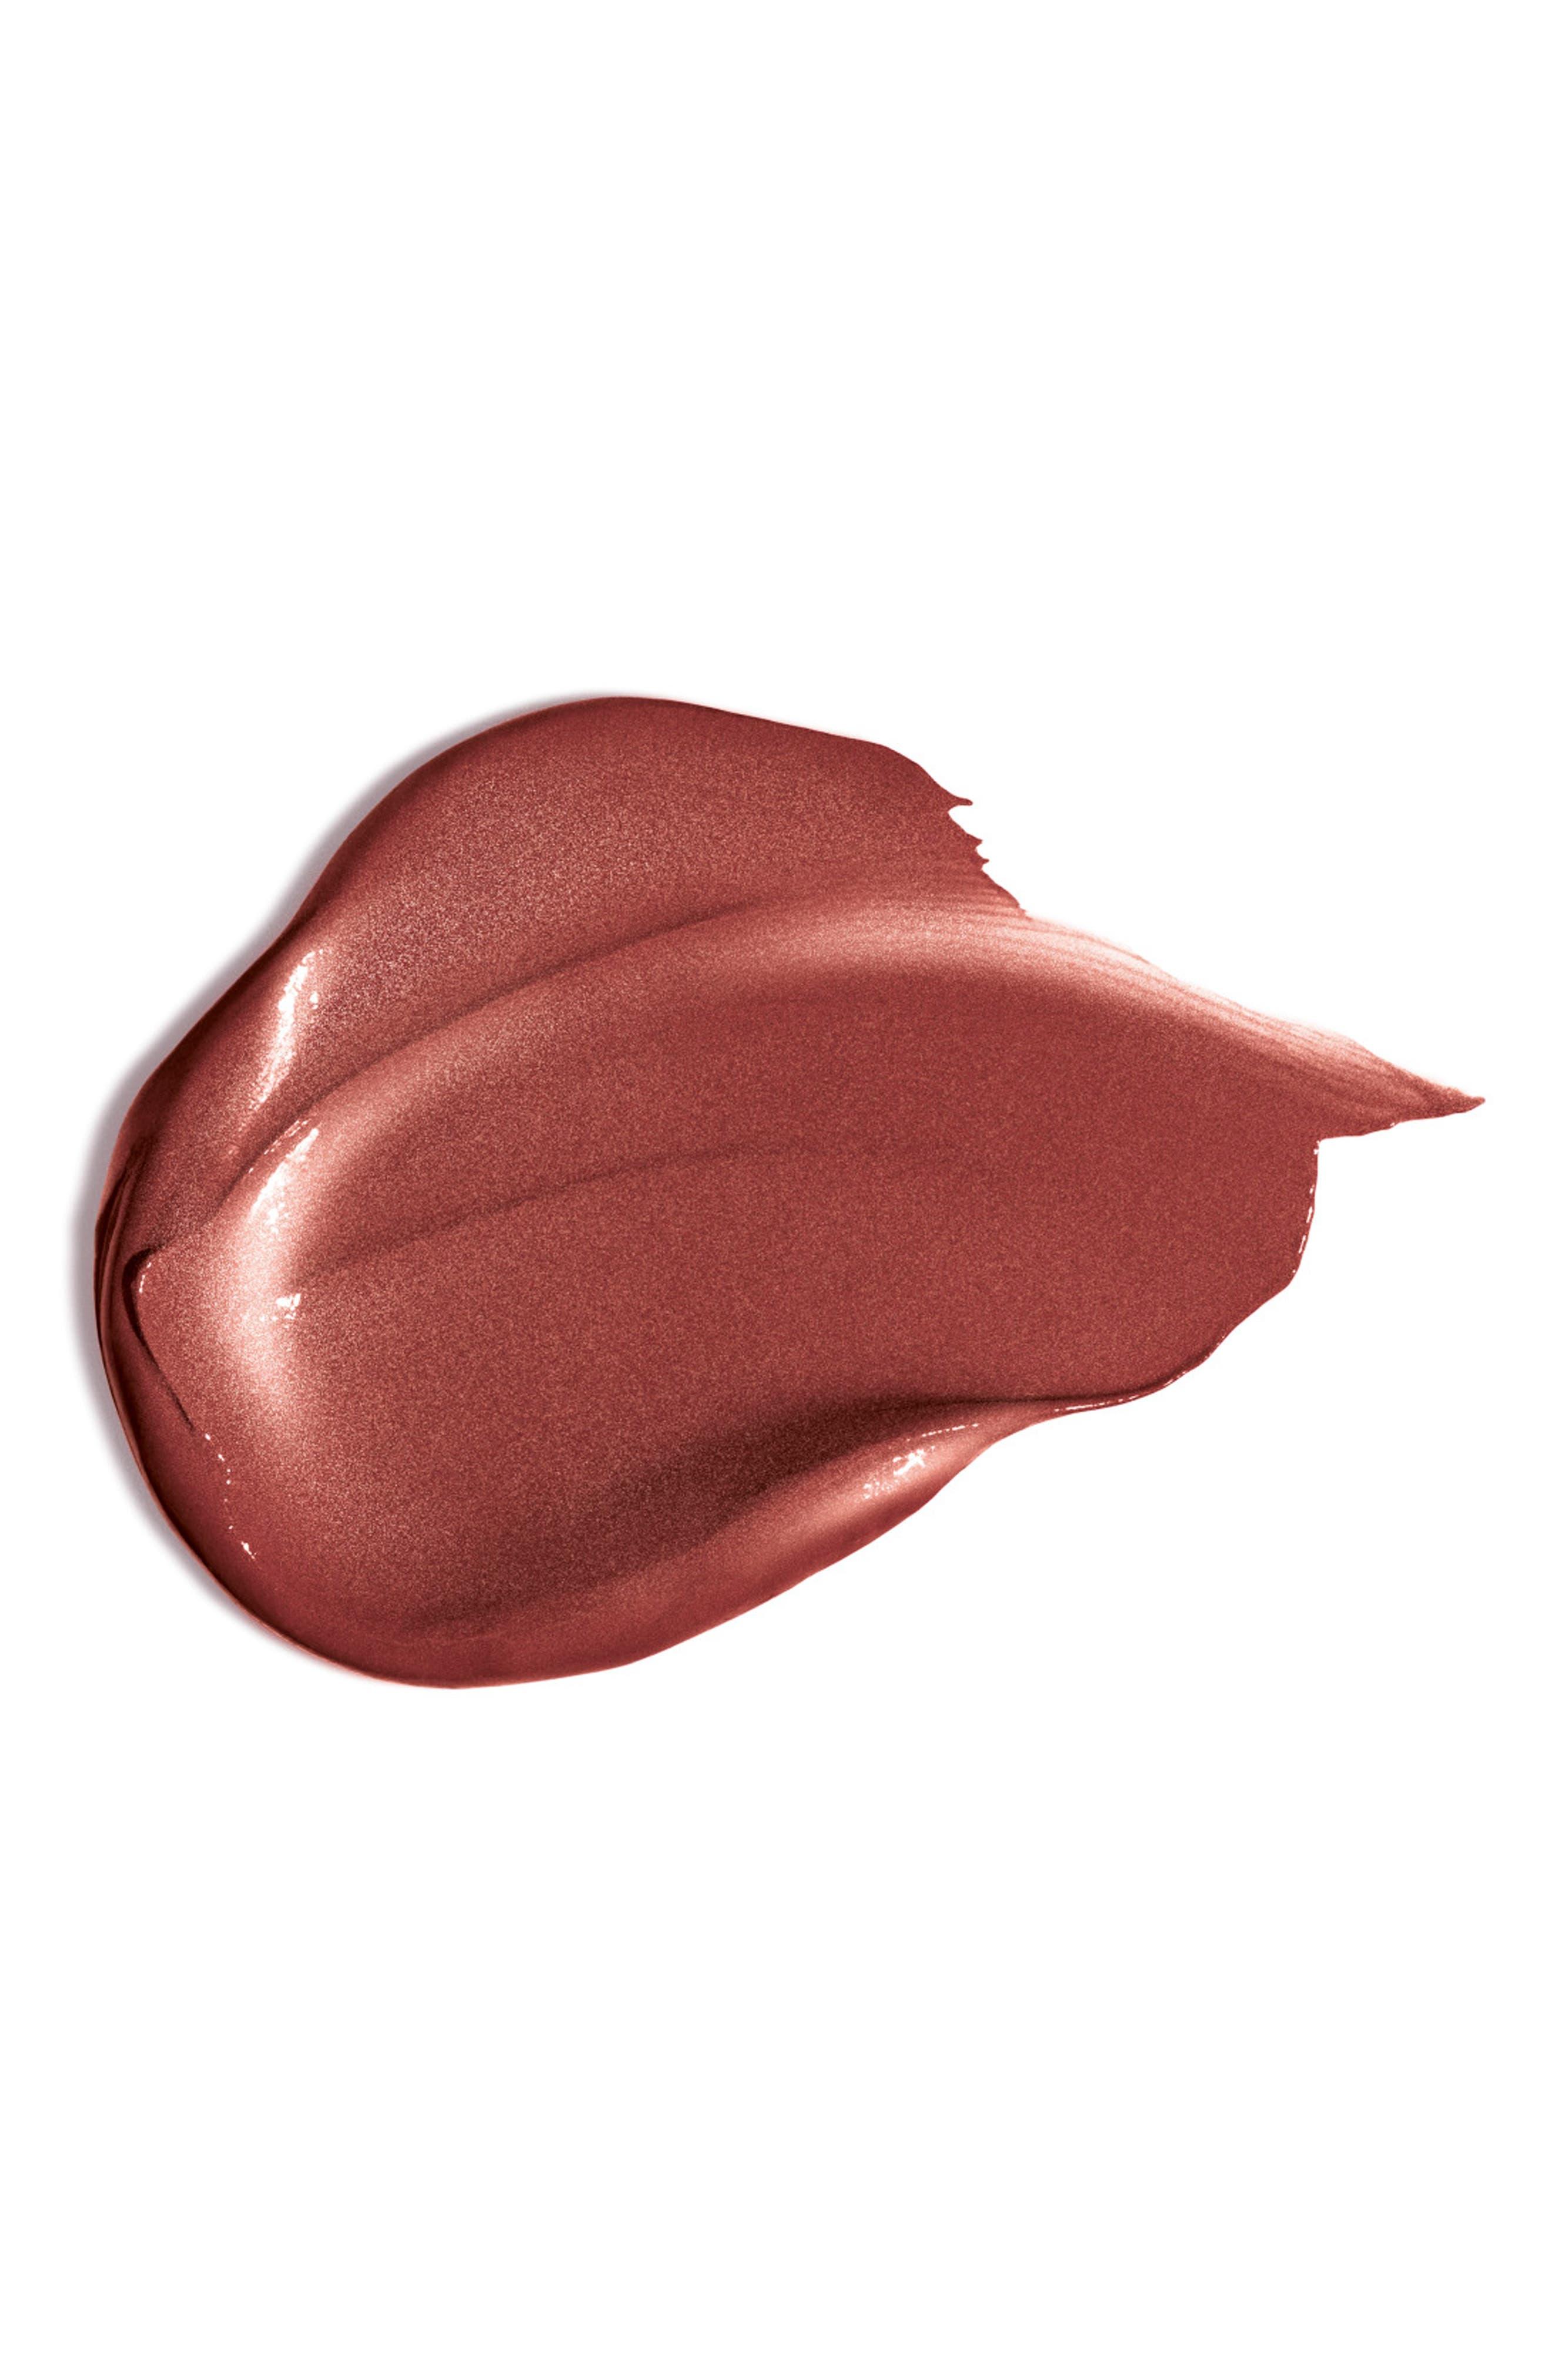 CLARINS, Joli Rouge Brilliant Sheer Lipstick, Alternate thumbnail 2, color, 757 NUDE BRICK